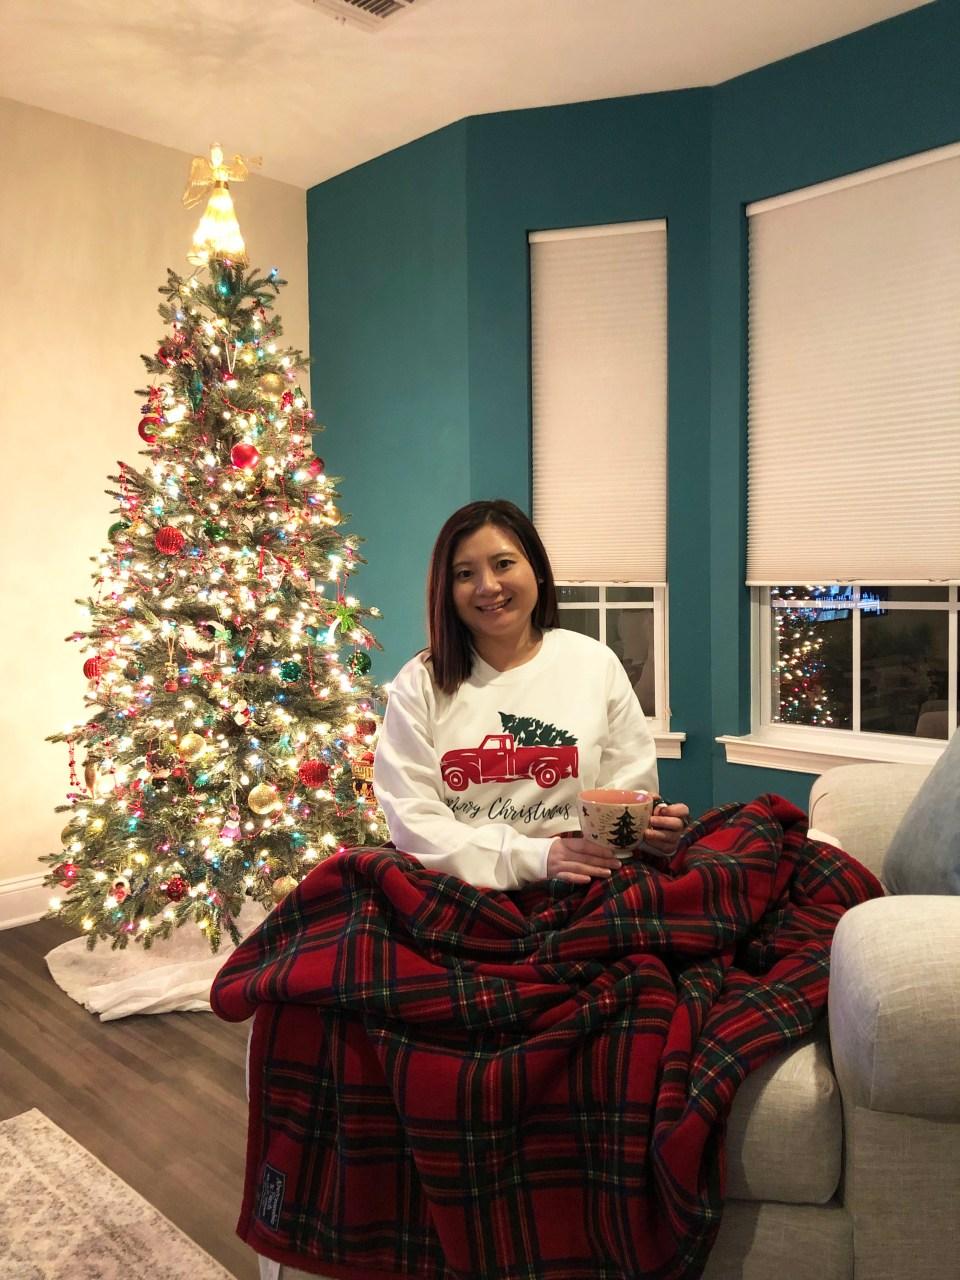 Christmas Tree Truck Sweatshirt + Plaid Sherpa Blanket 2